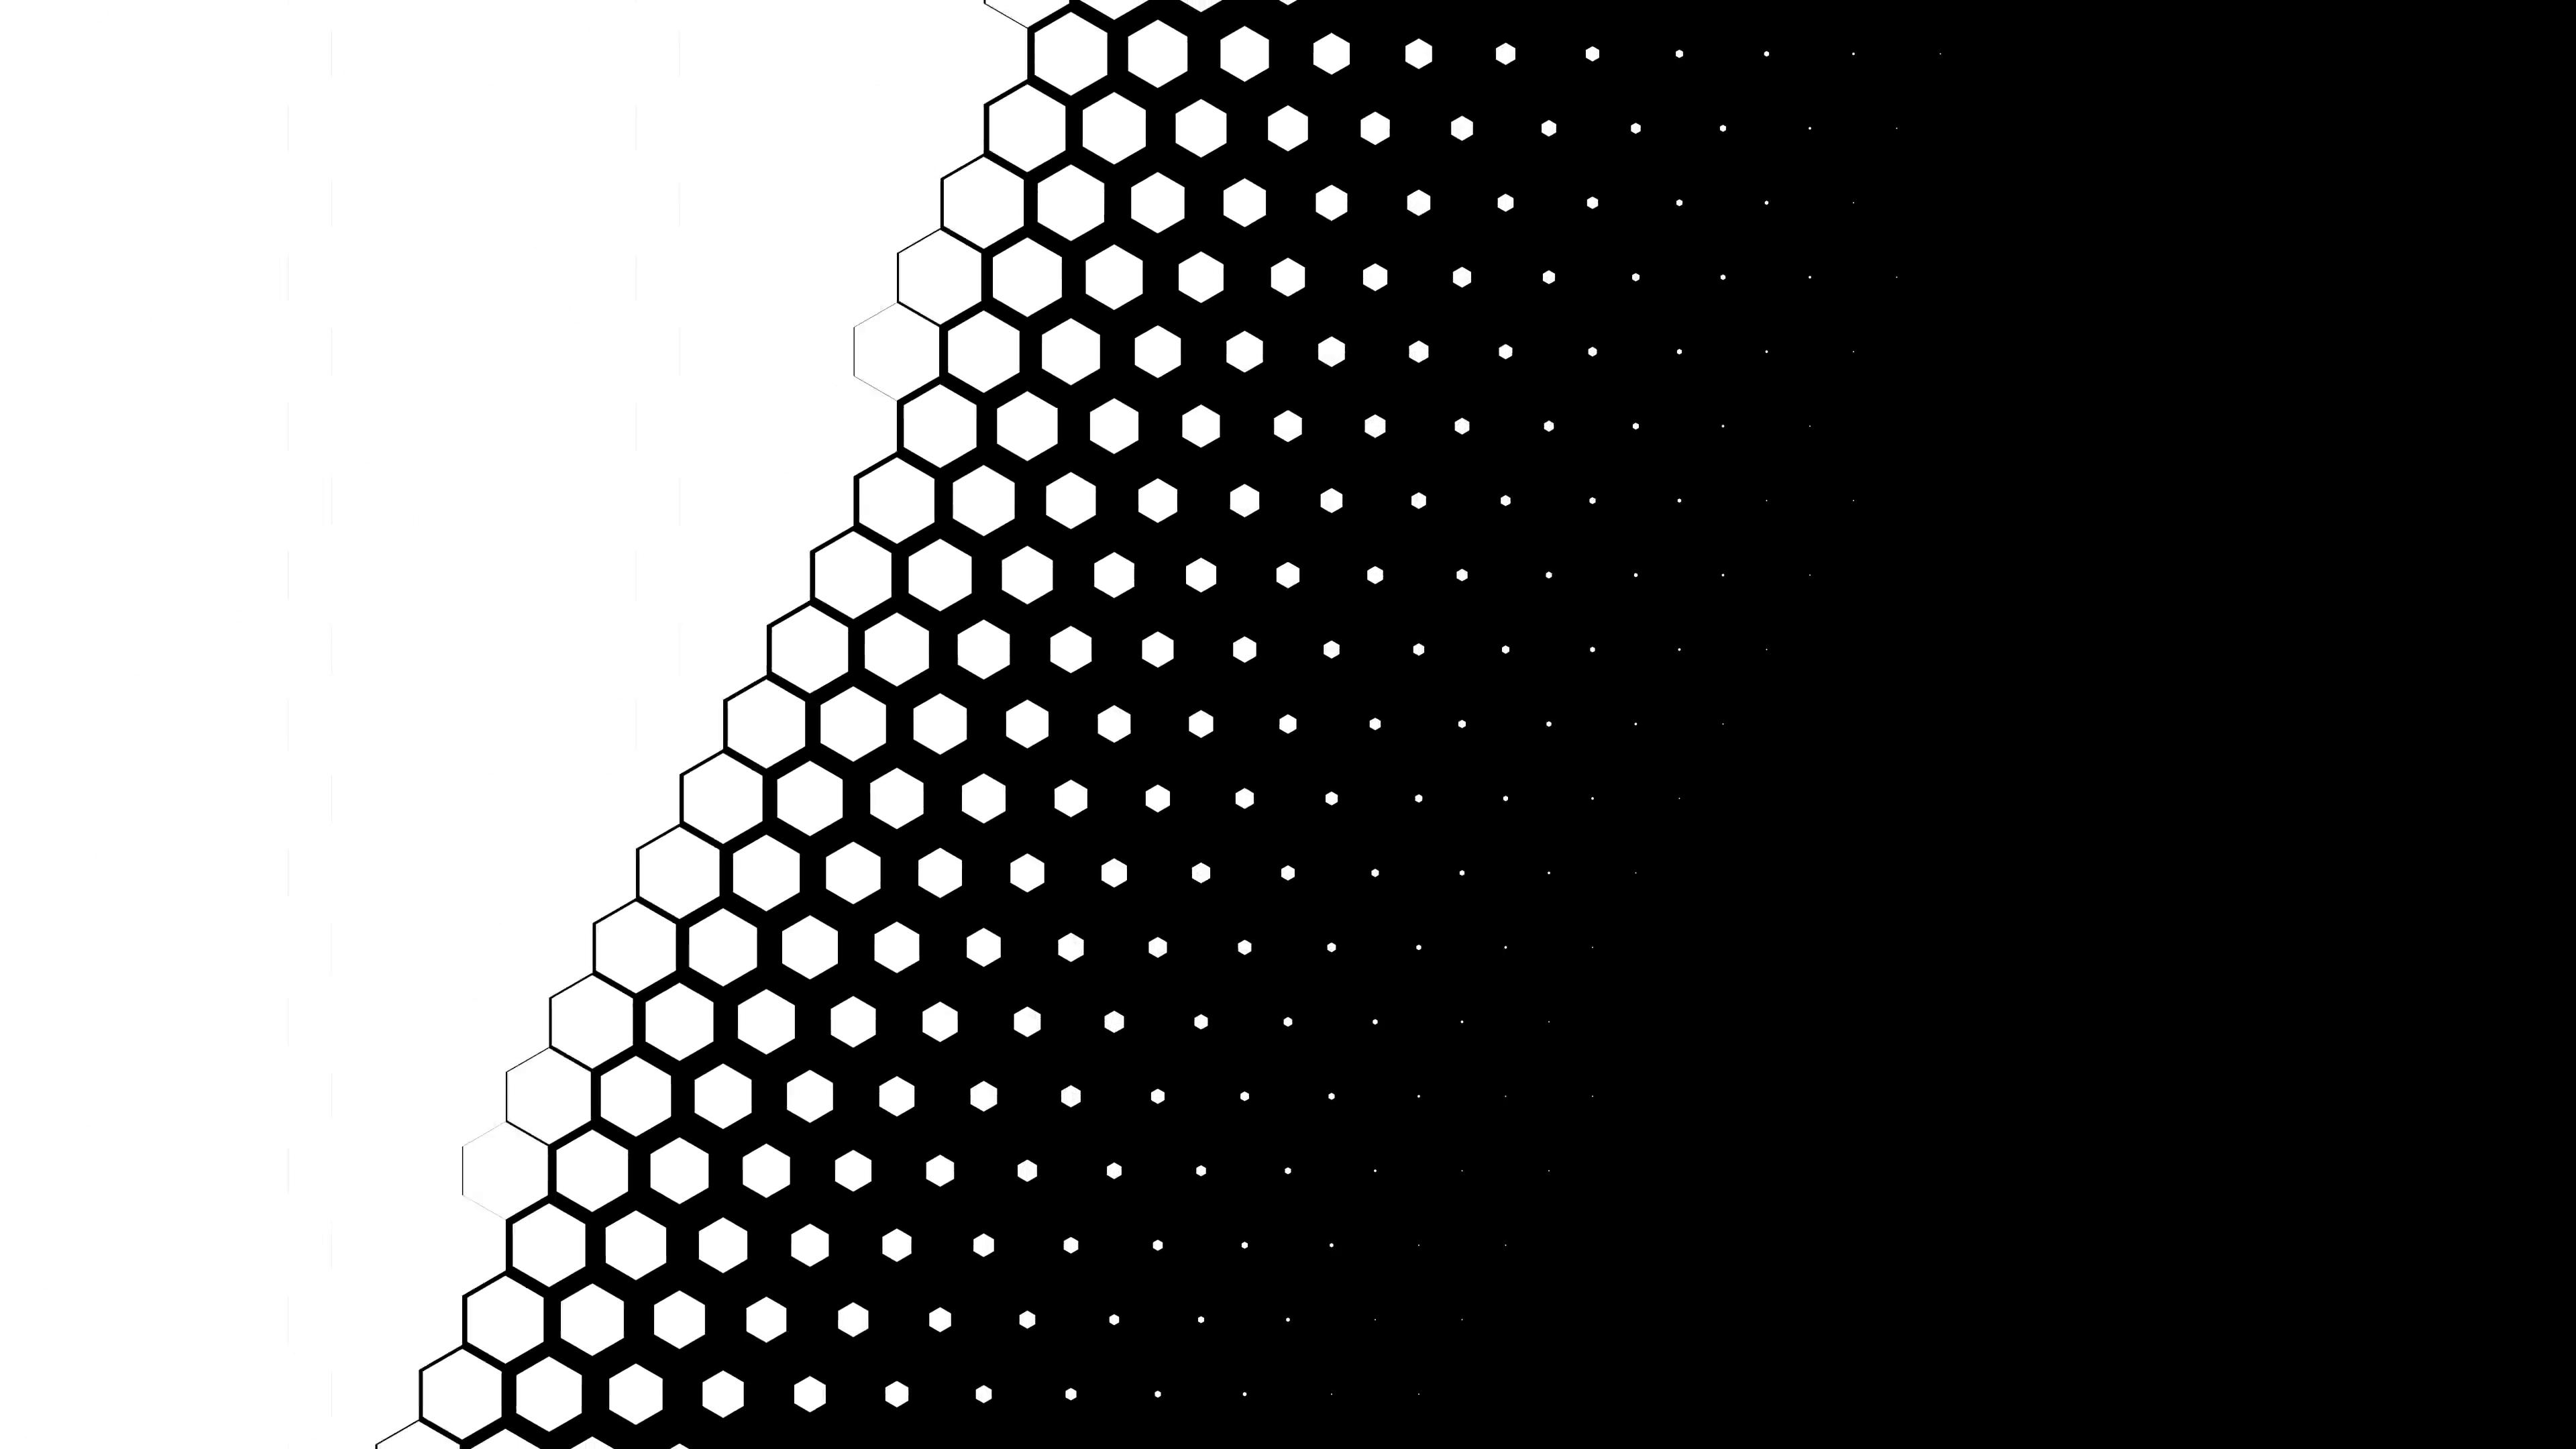 Hexagon Transition Matte, Diagonal, 60fps Motion Background.